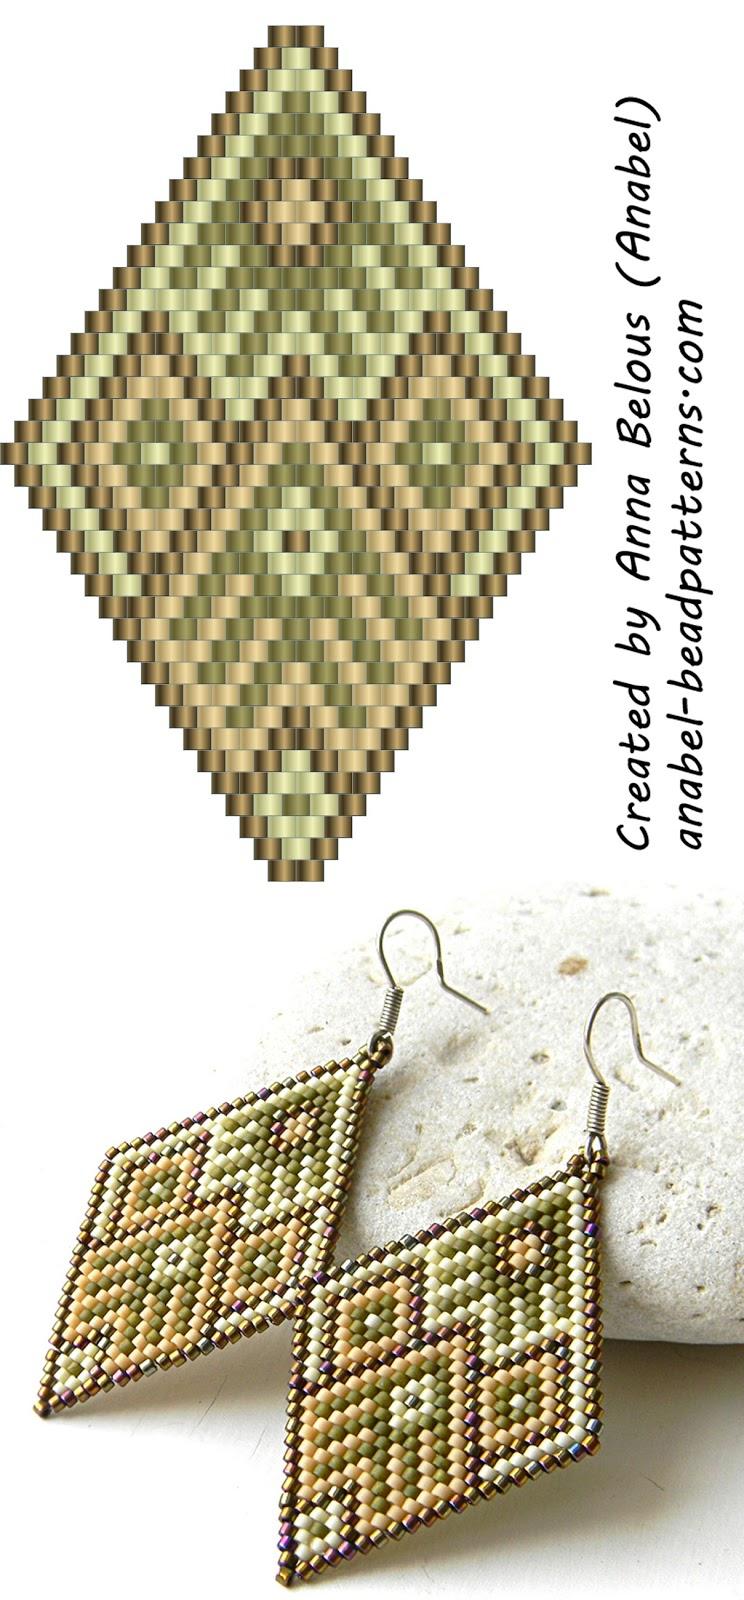 Схема серег-ромбов из бисера - мозаичное плетение - peyote earrings pattern